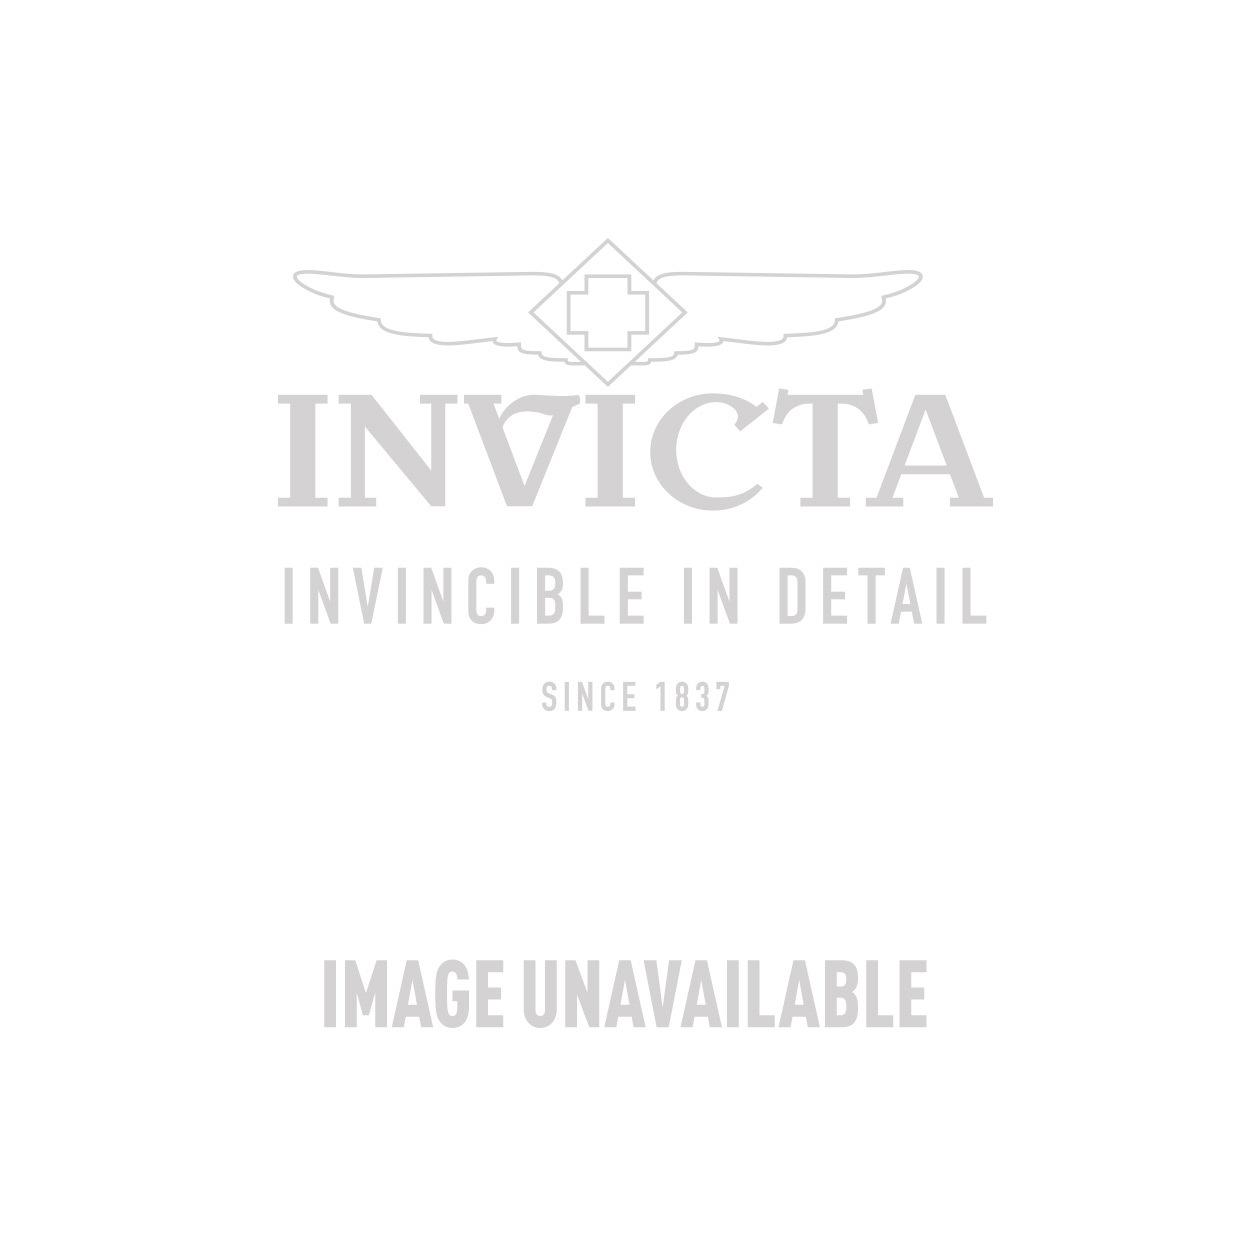 Invicta S1 Rally Quartz Watch - Black case with Black, White tone Leather band - Model 19293